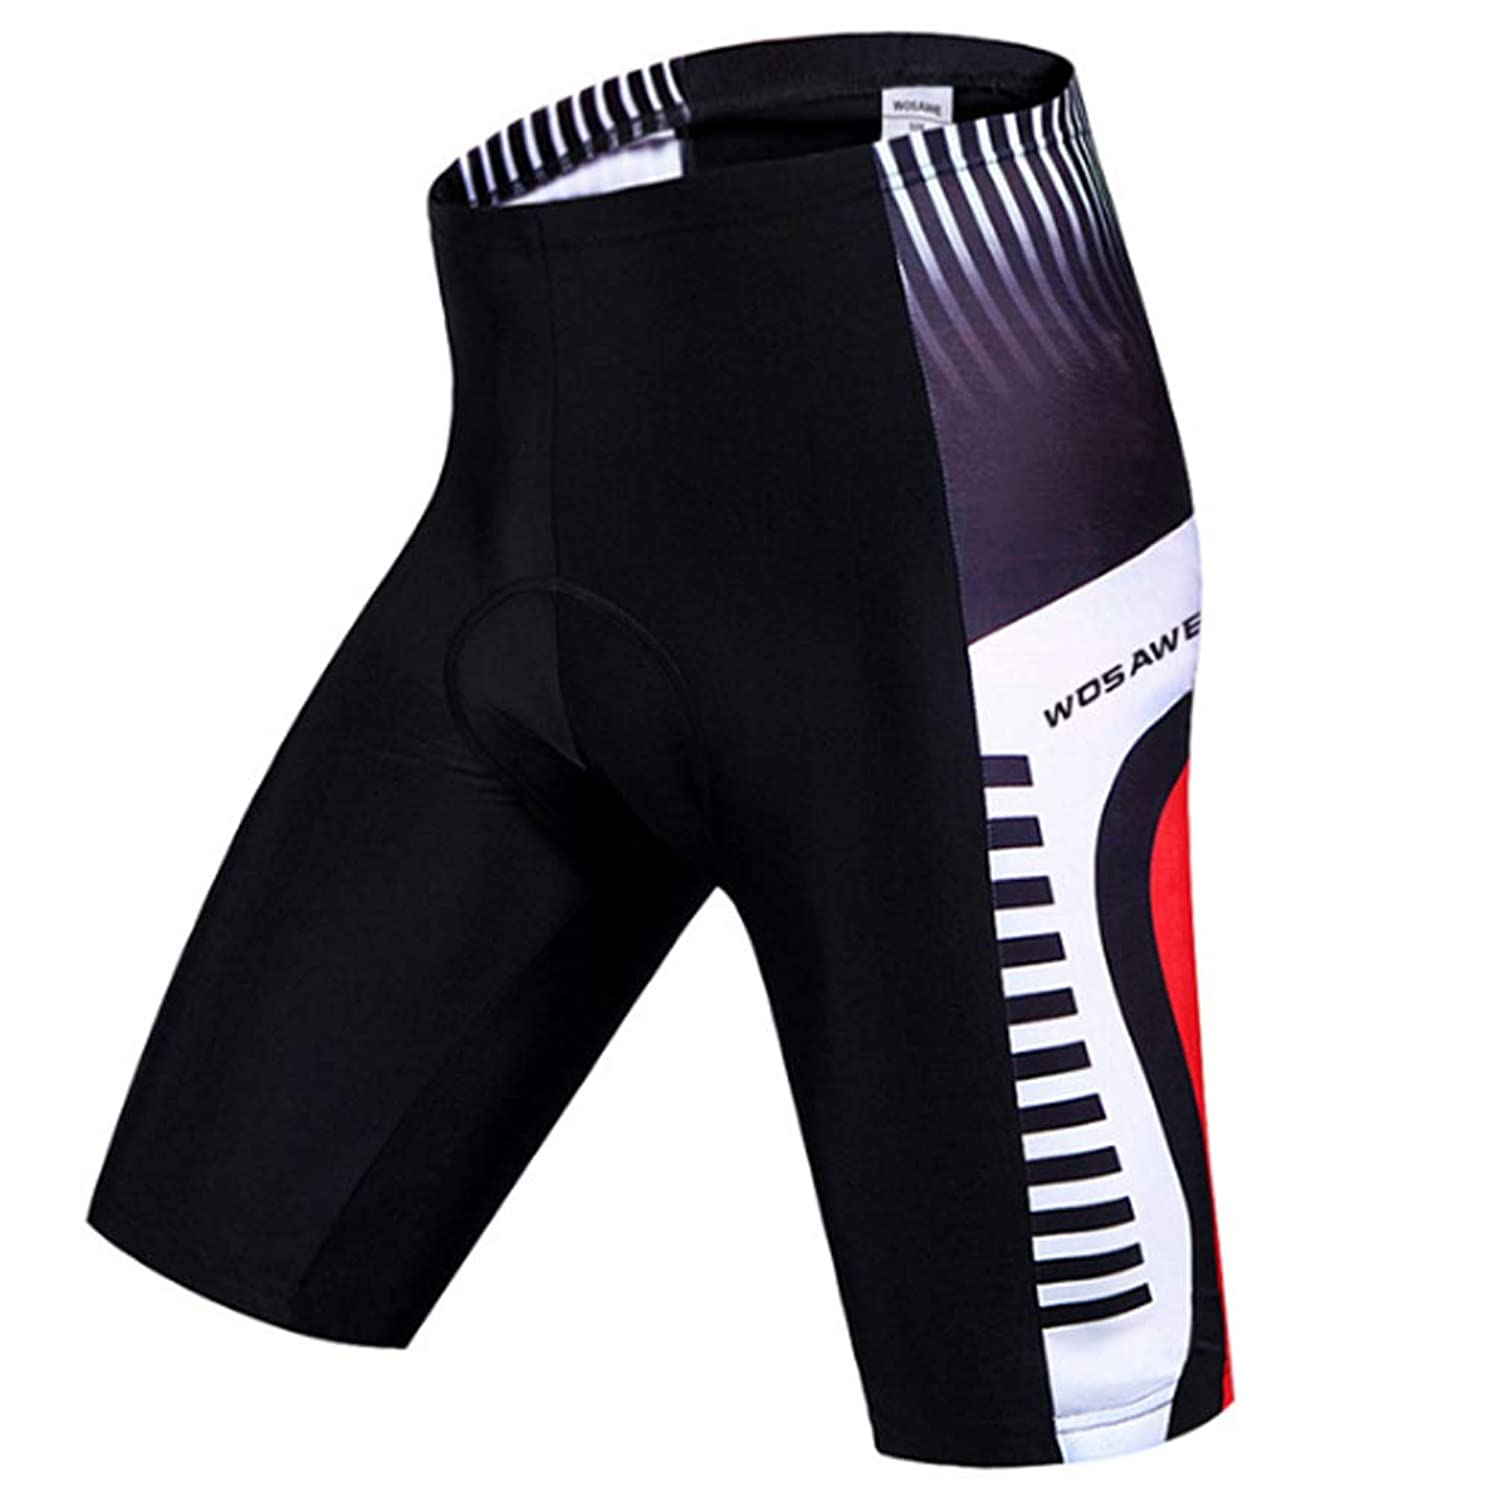 HBRT Men's Cycling Shorts Padded, Bicycle Riding Pants, Bike Biking Clothes,Summer Cycle Wear Tights for Running Riding Basketball